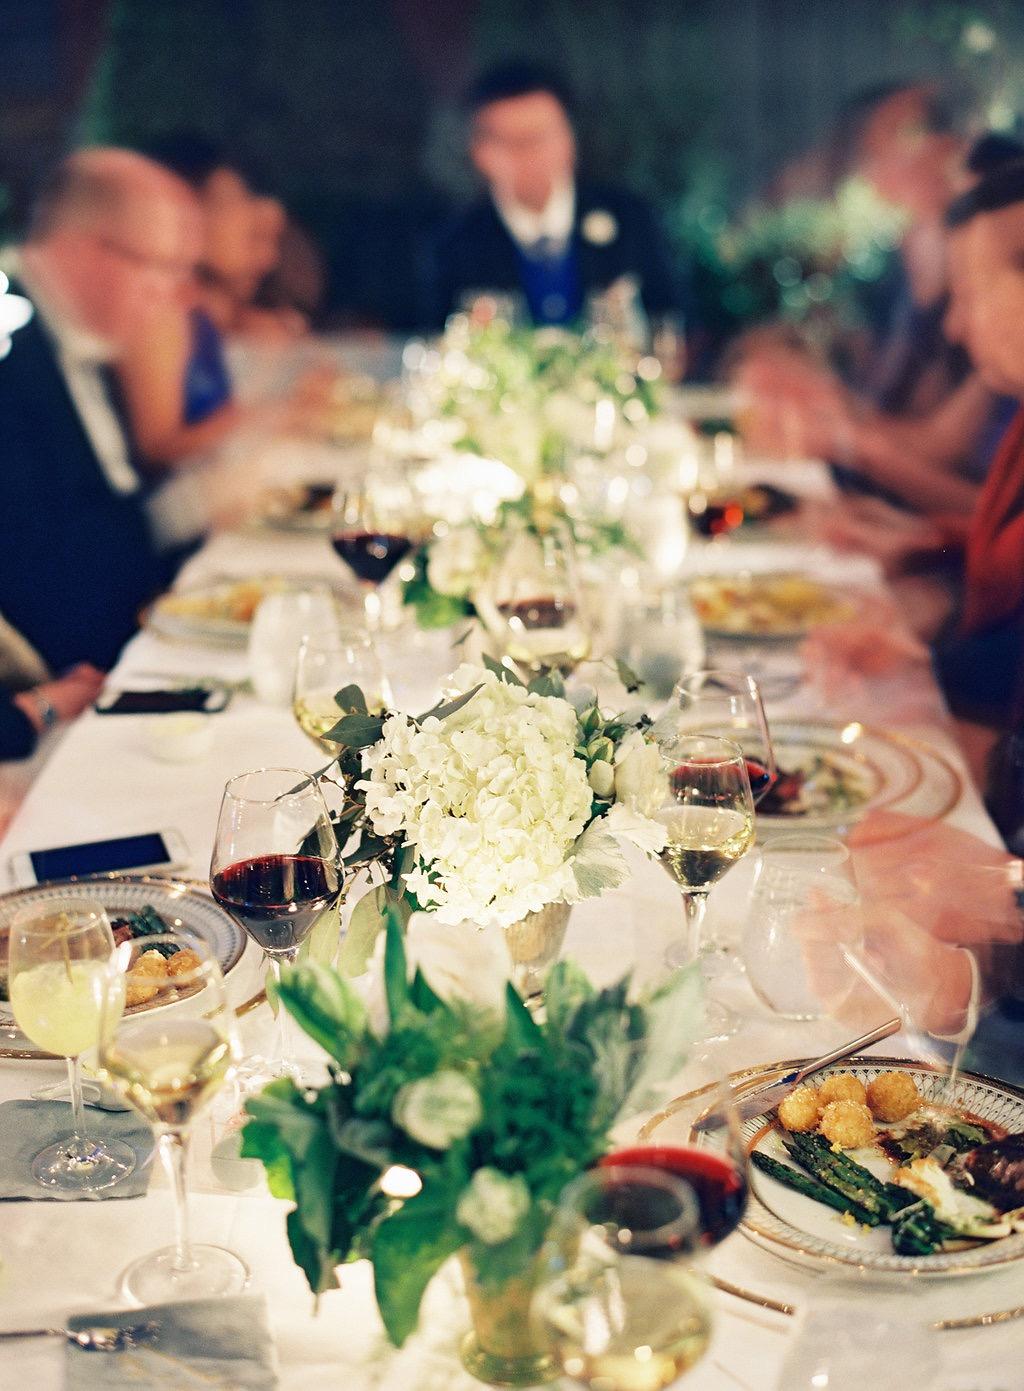 amelia_johnson_photography_gane-gibson_wedding11.jpg